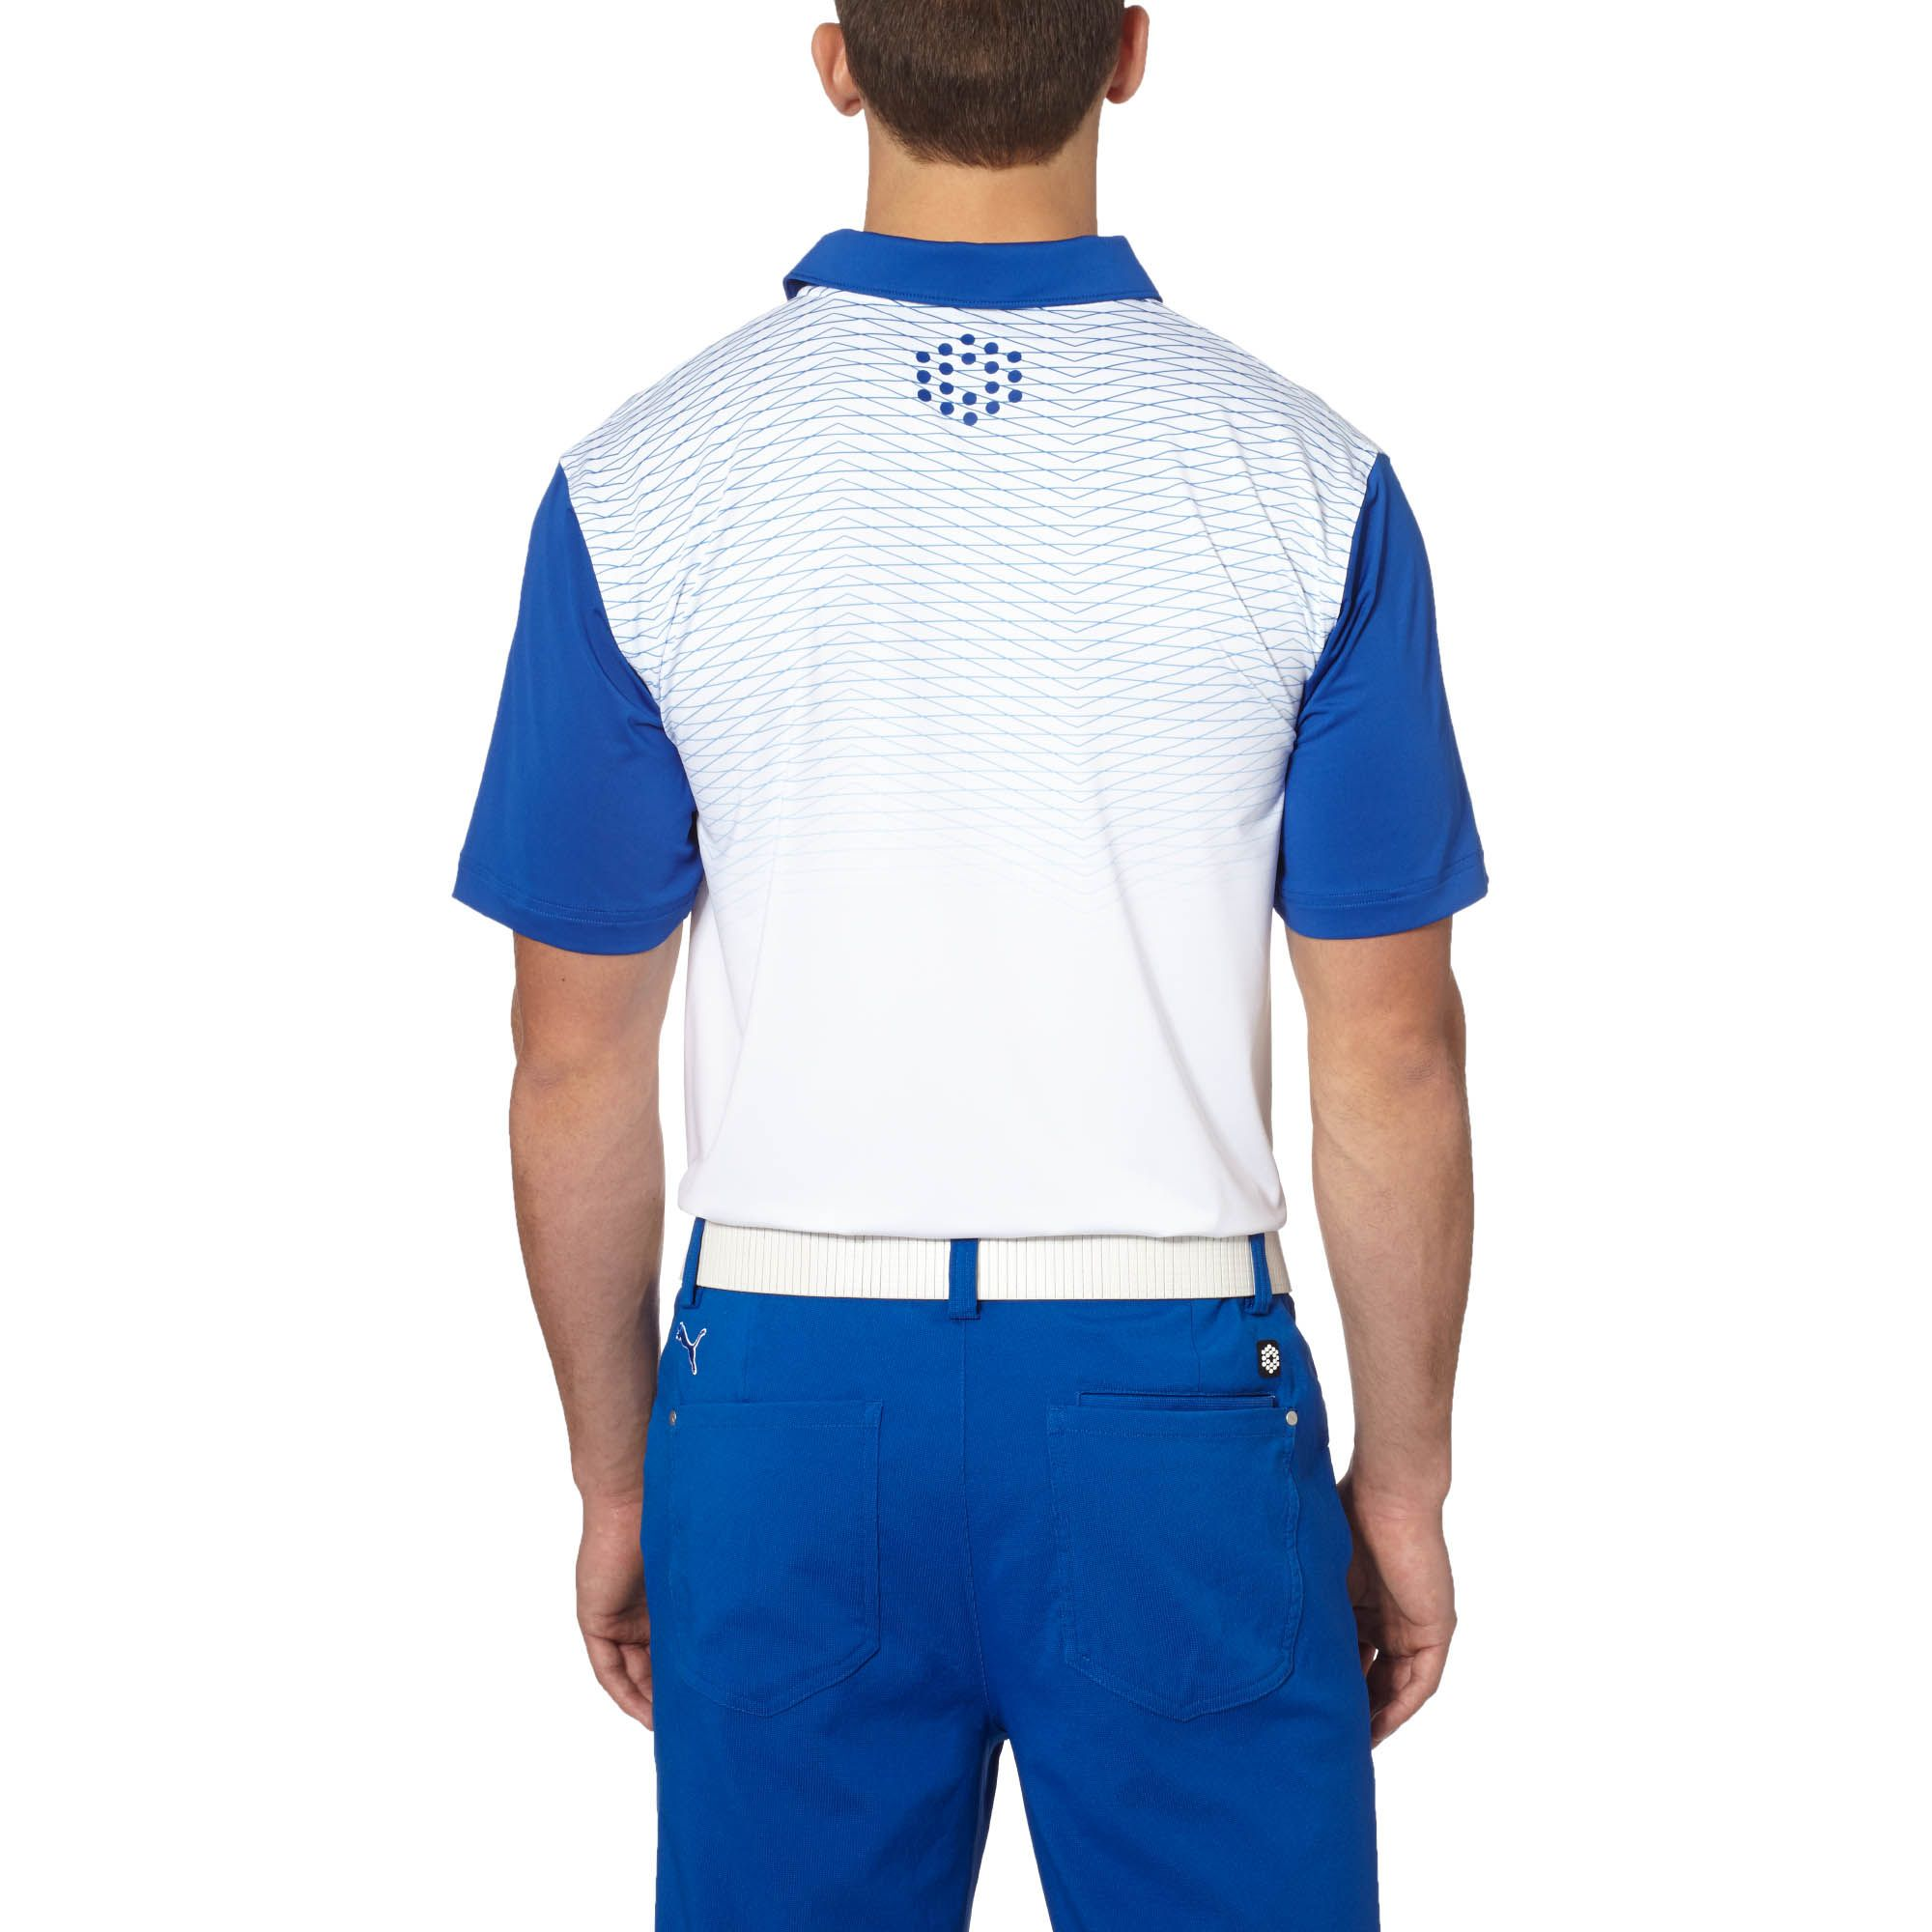 PUMA Colorblock Fade Golf Polo Shirt | eBay